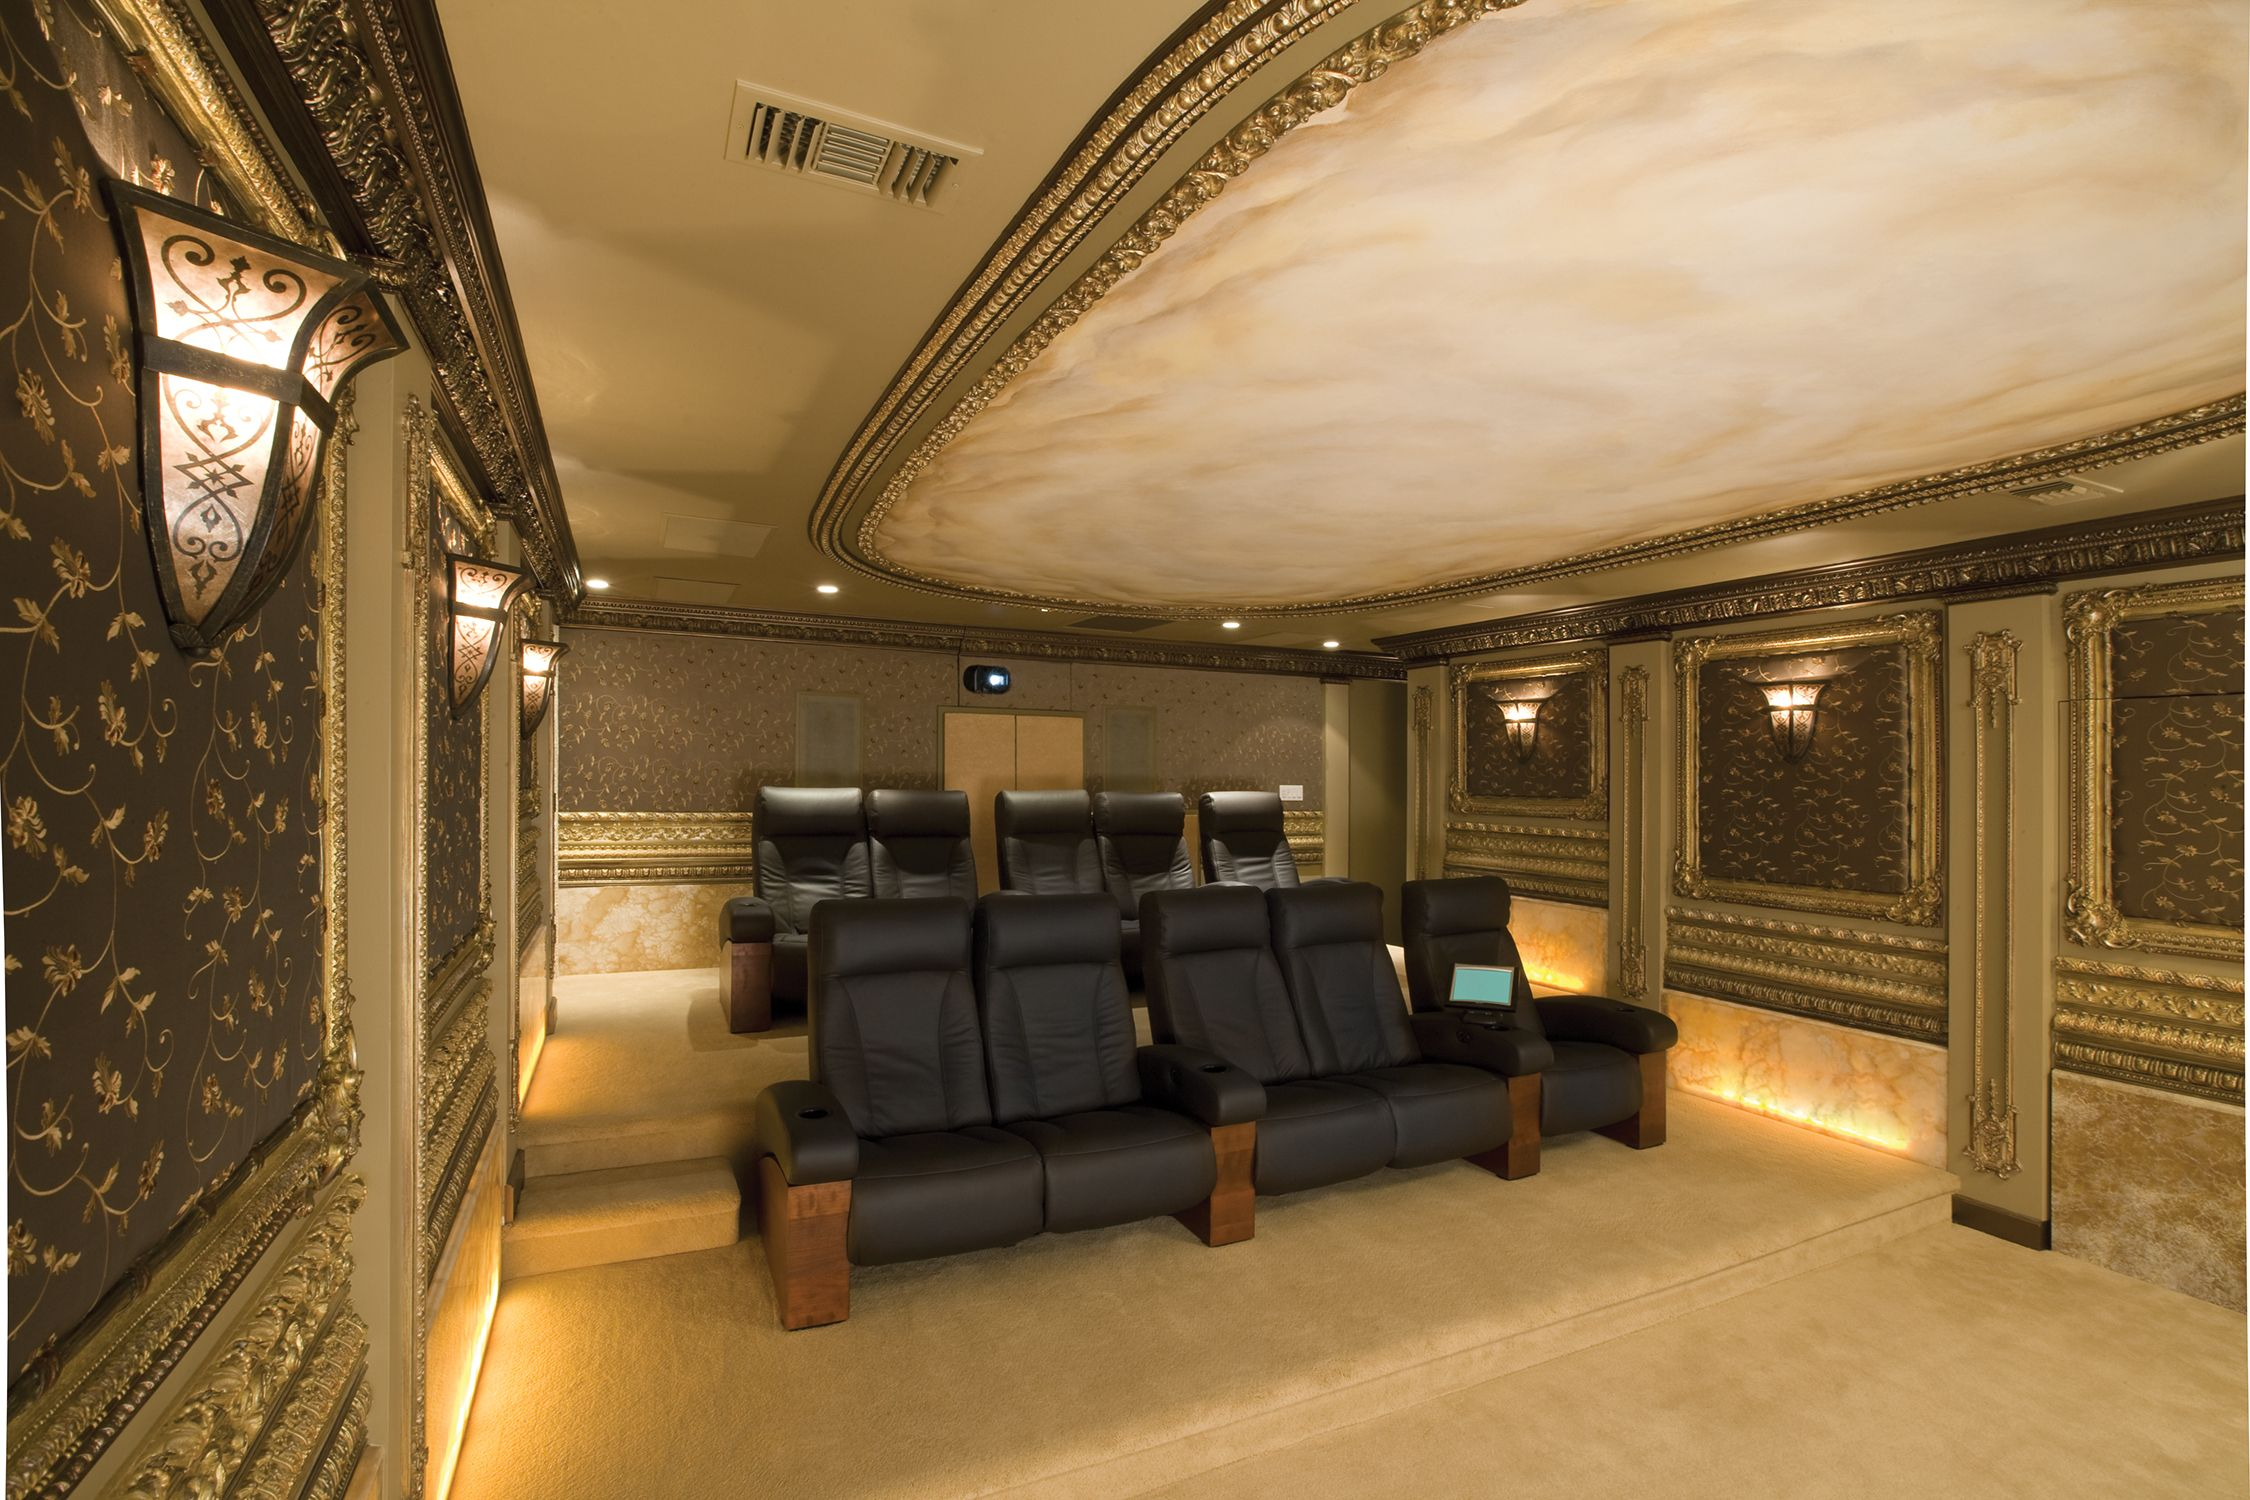 theatre room lighting. Lights For Theater Room Theatre Lighting